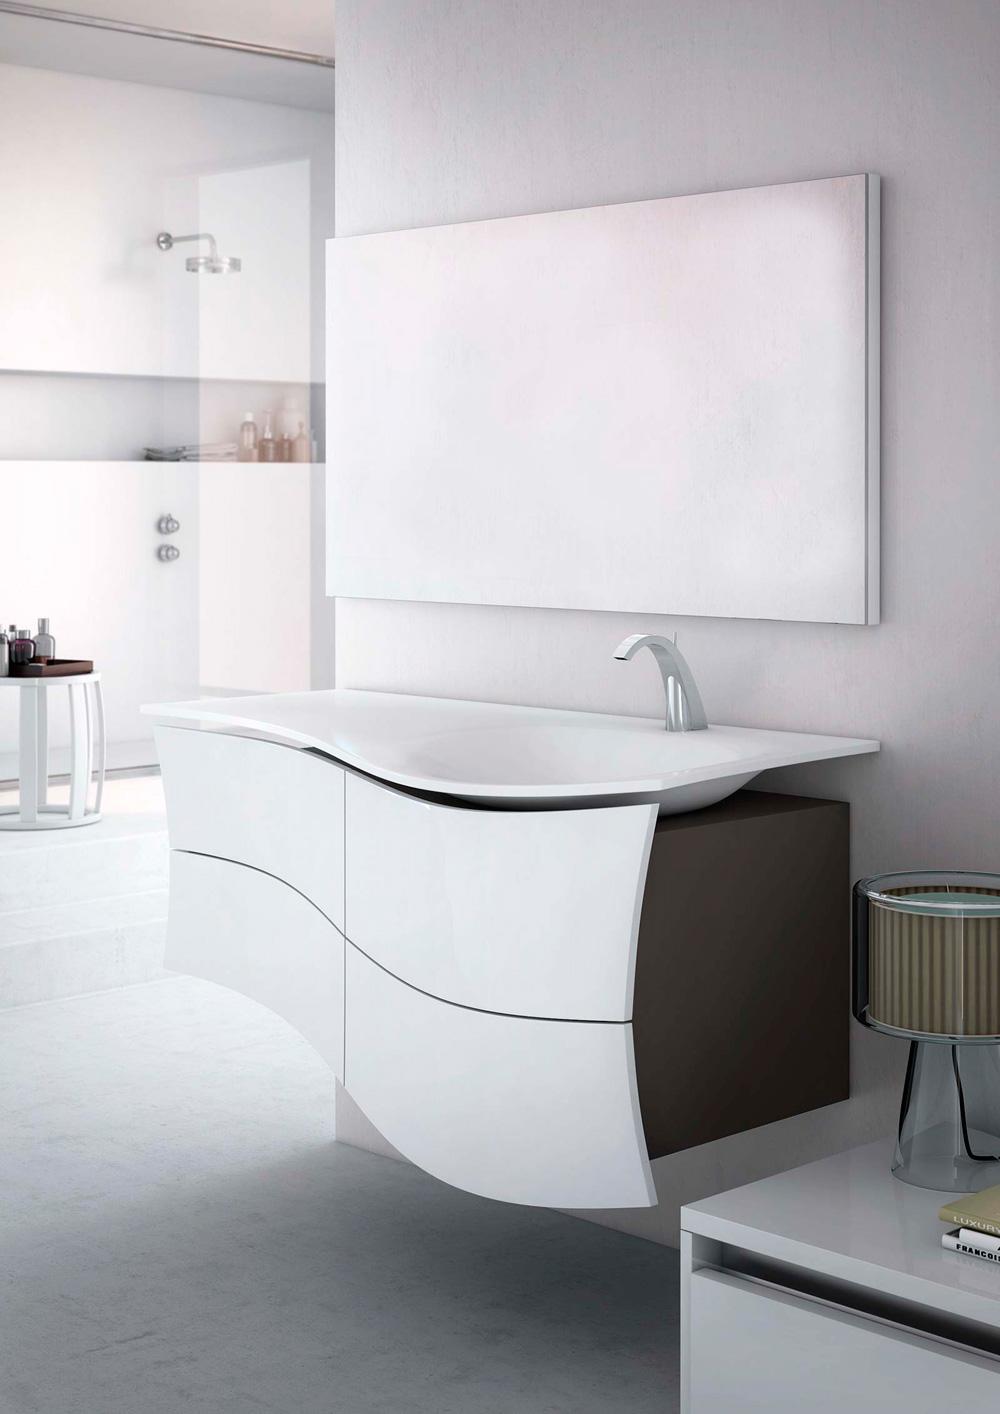 Meubles salle de bain Maestro Decotec  Schmitt-Ney